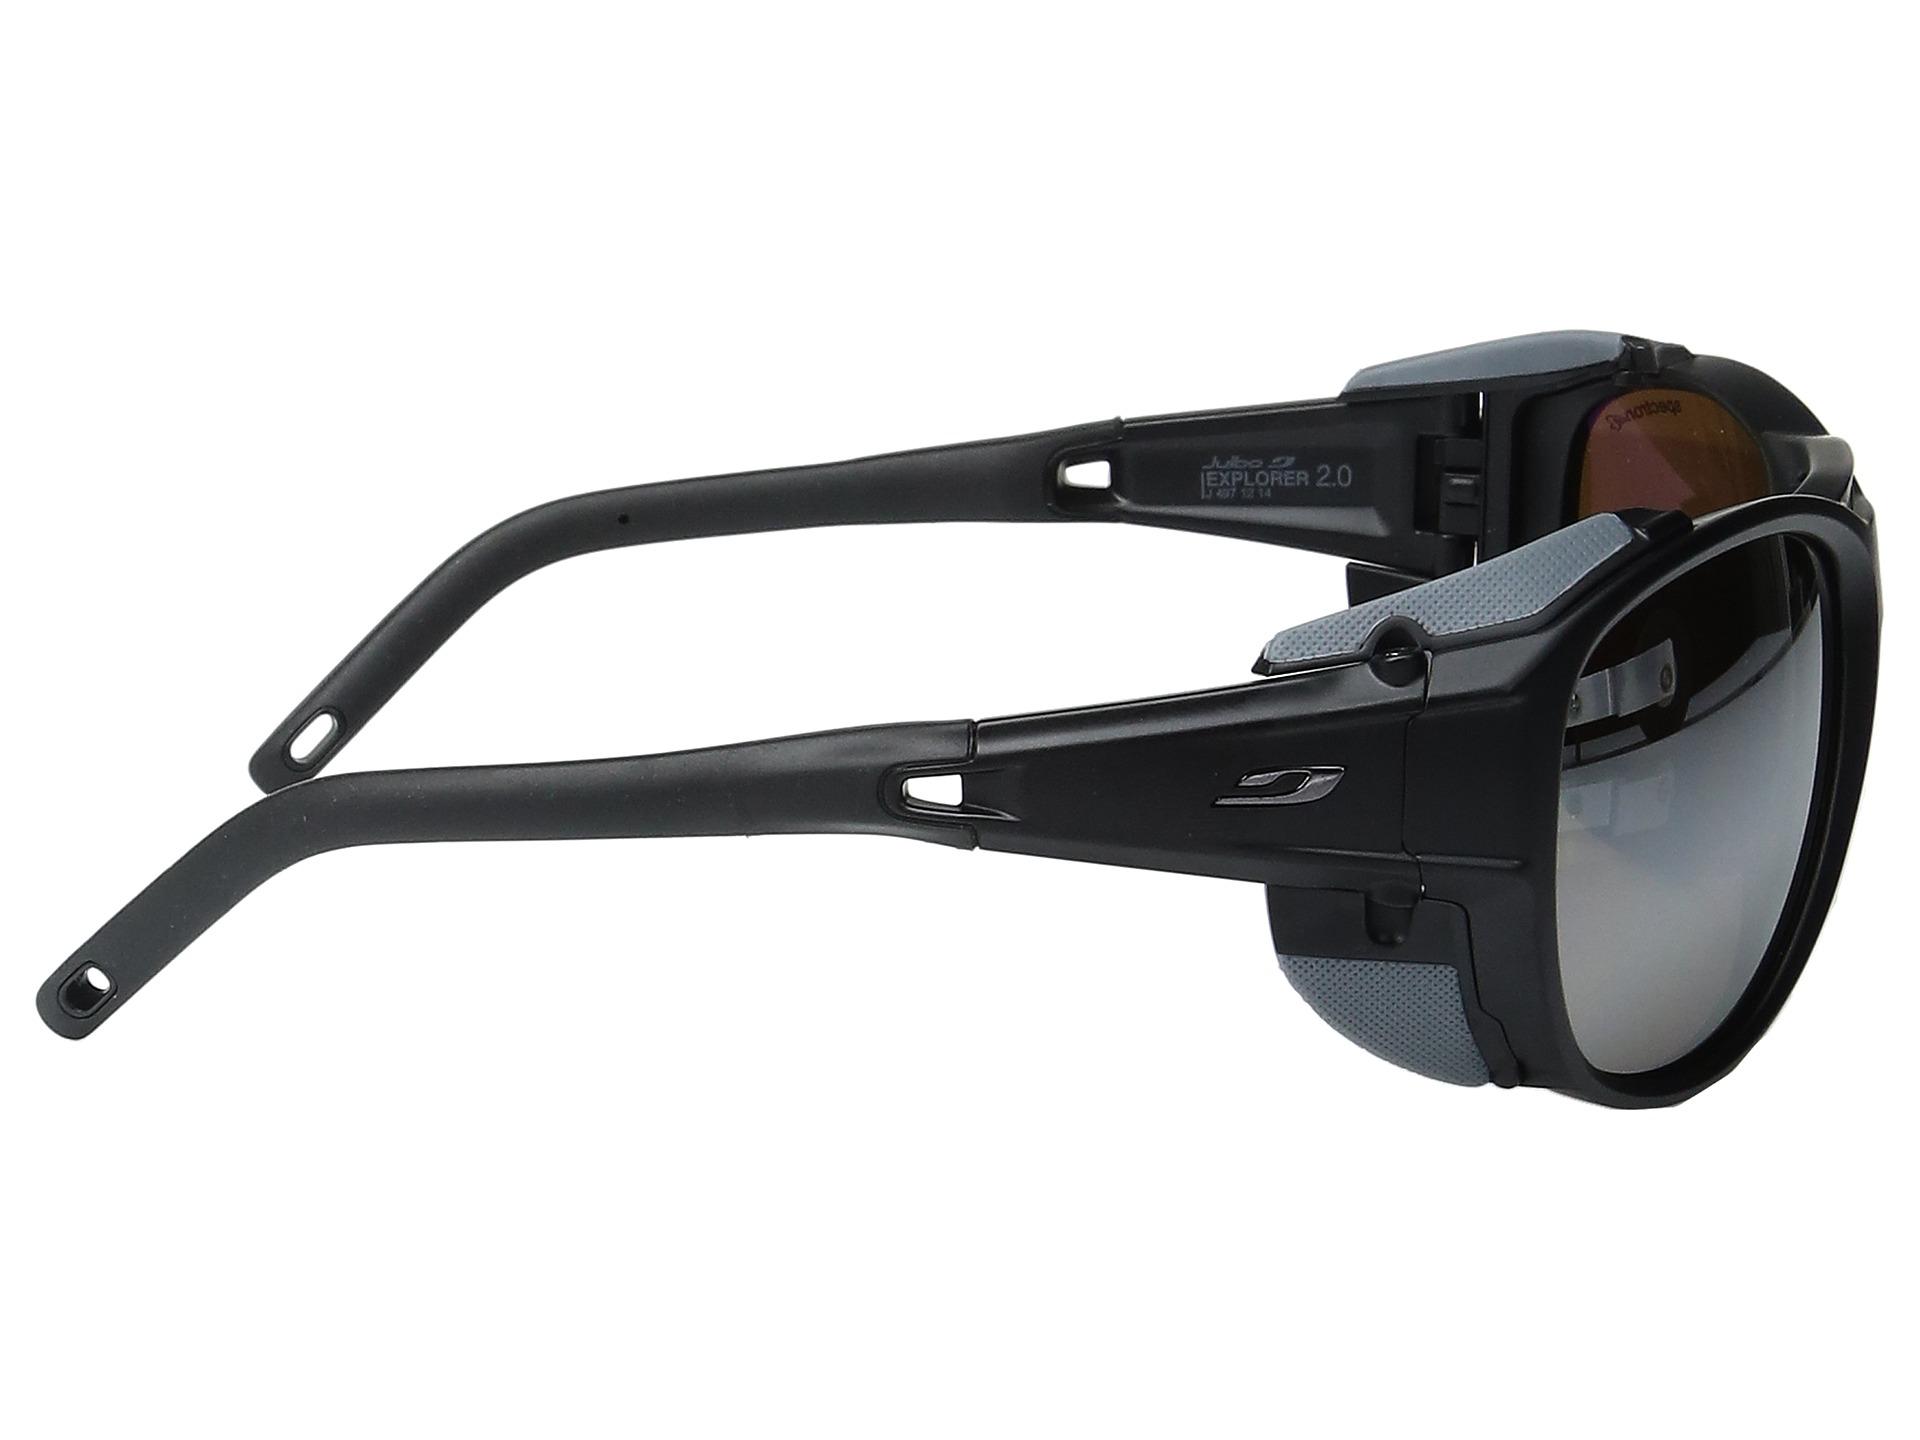 94ab229a86c Julbo Eyewear Explorer 2.0 Sunglasses - slevi1.mit.edu Free Shipping BOTH  Ways